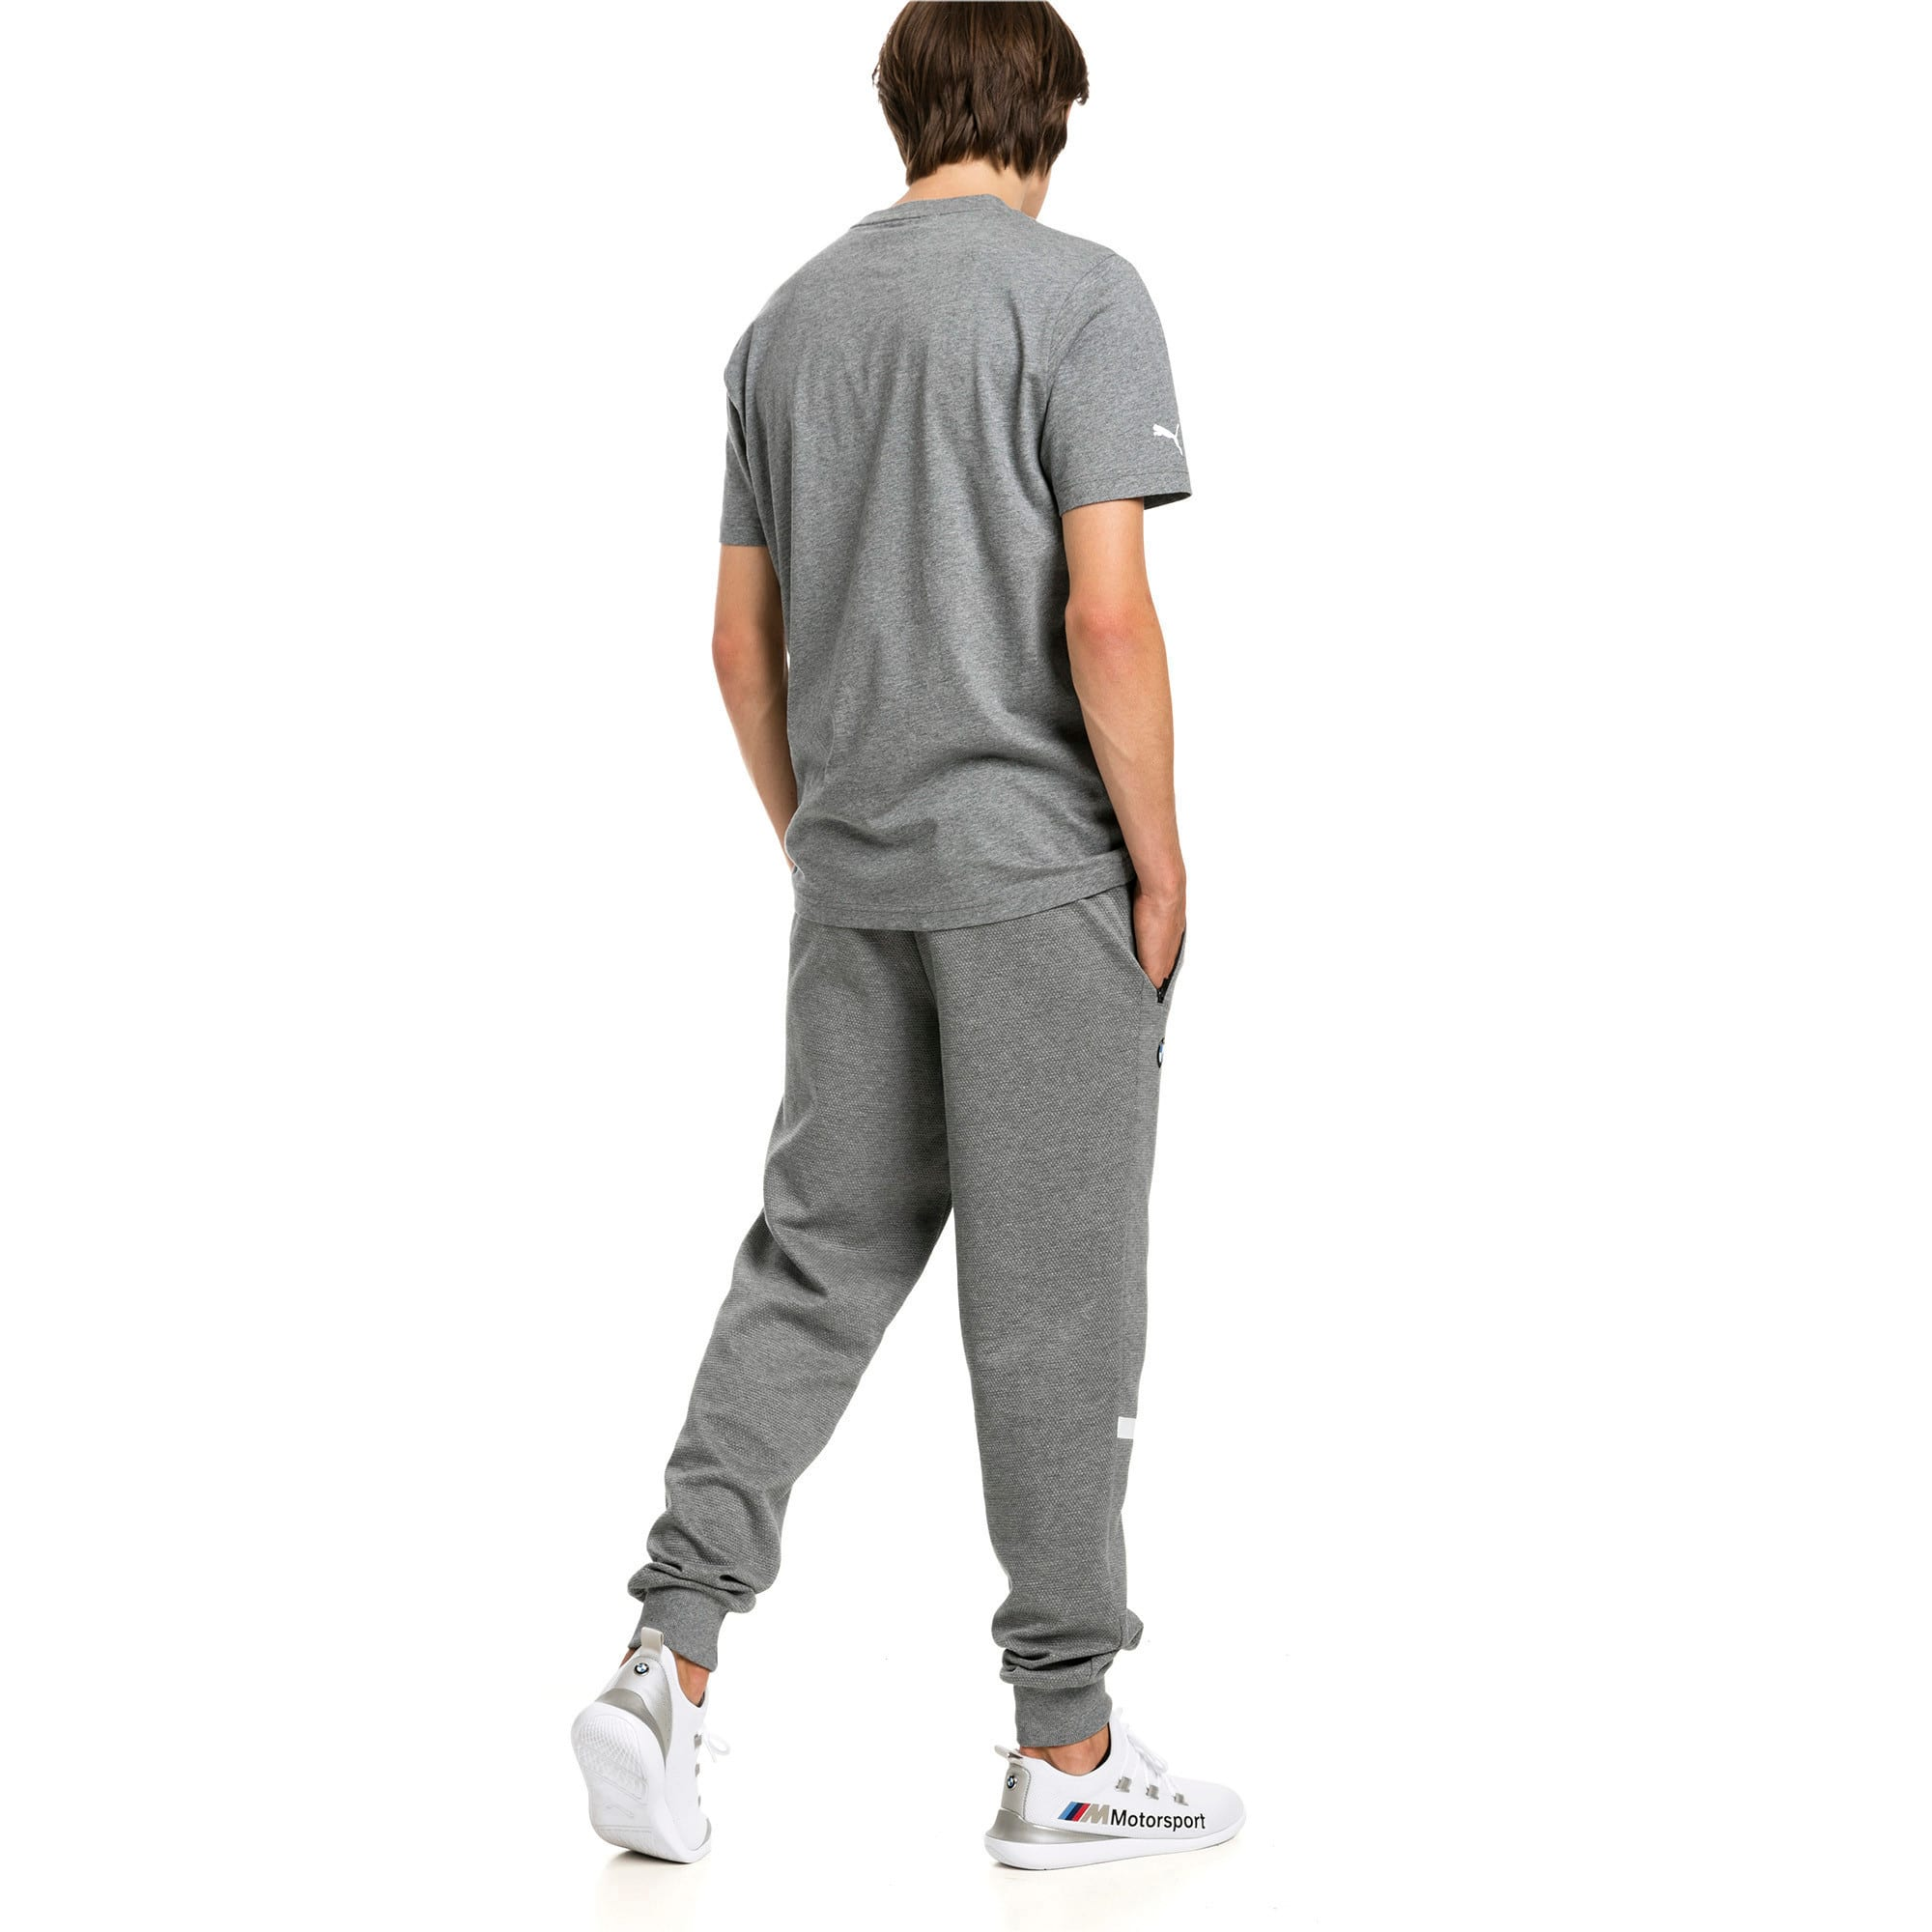 Thumbnail 2 of BMW Motorsport Knitted Men's Sweatpants, Medium Gray Heather, medium-IND